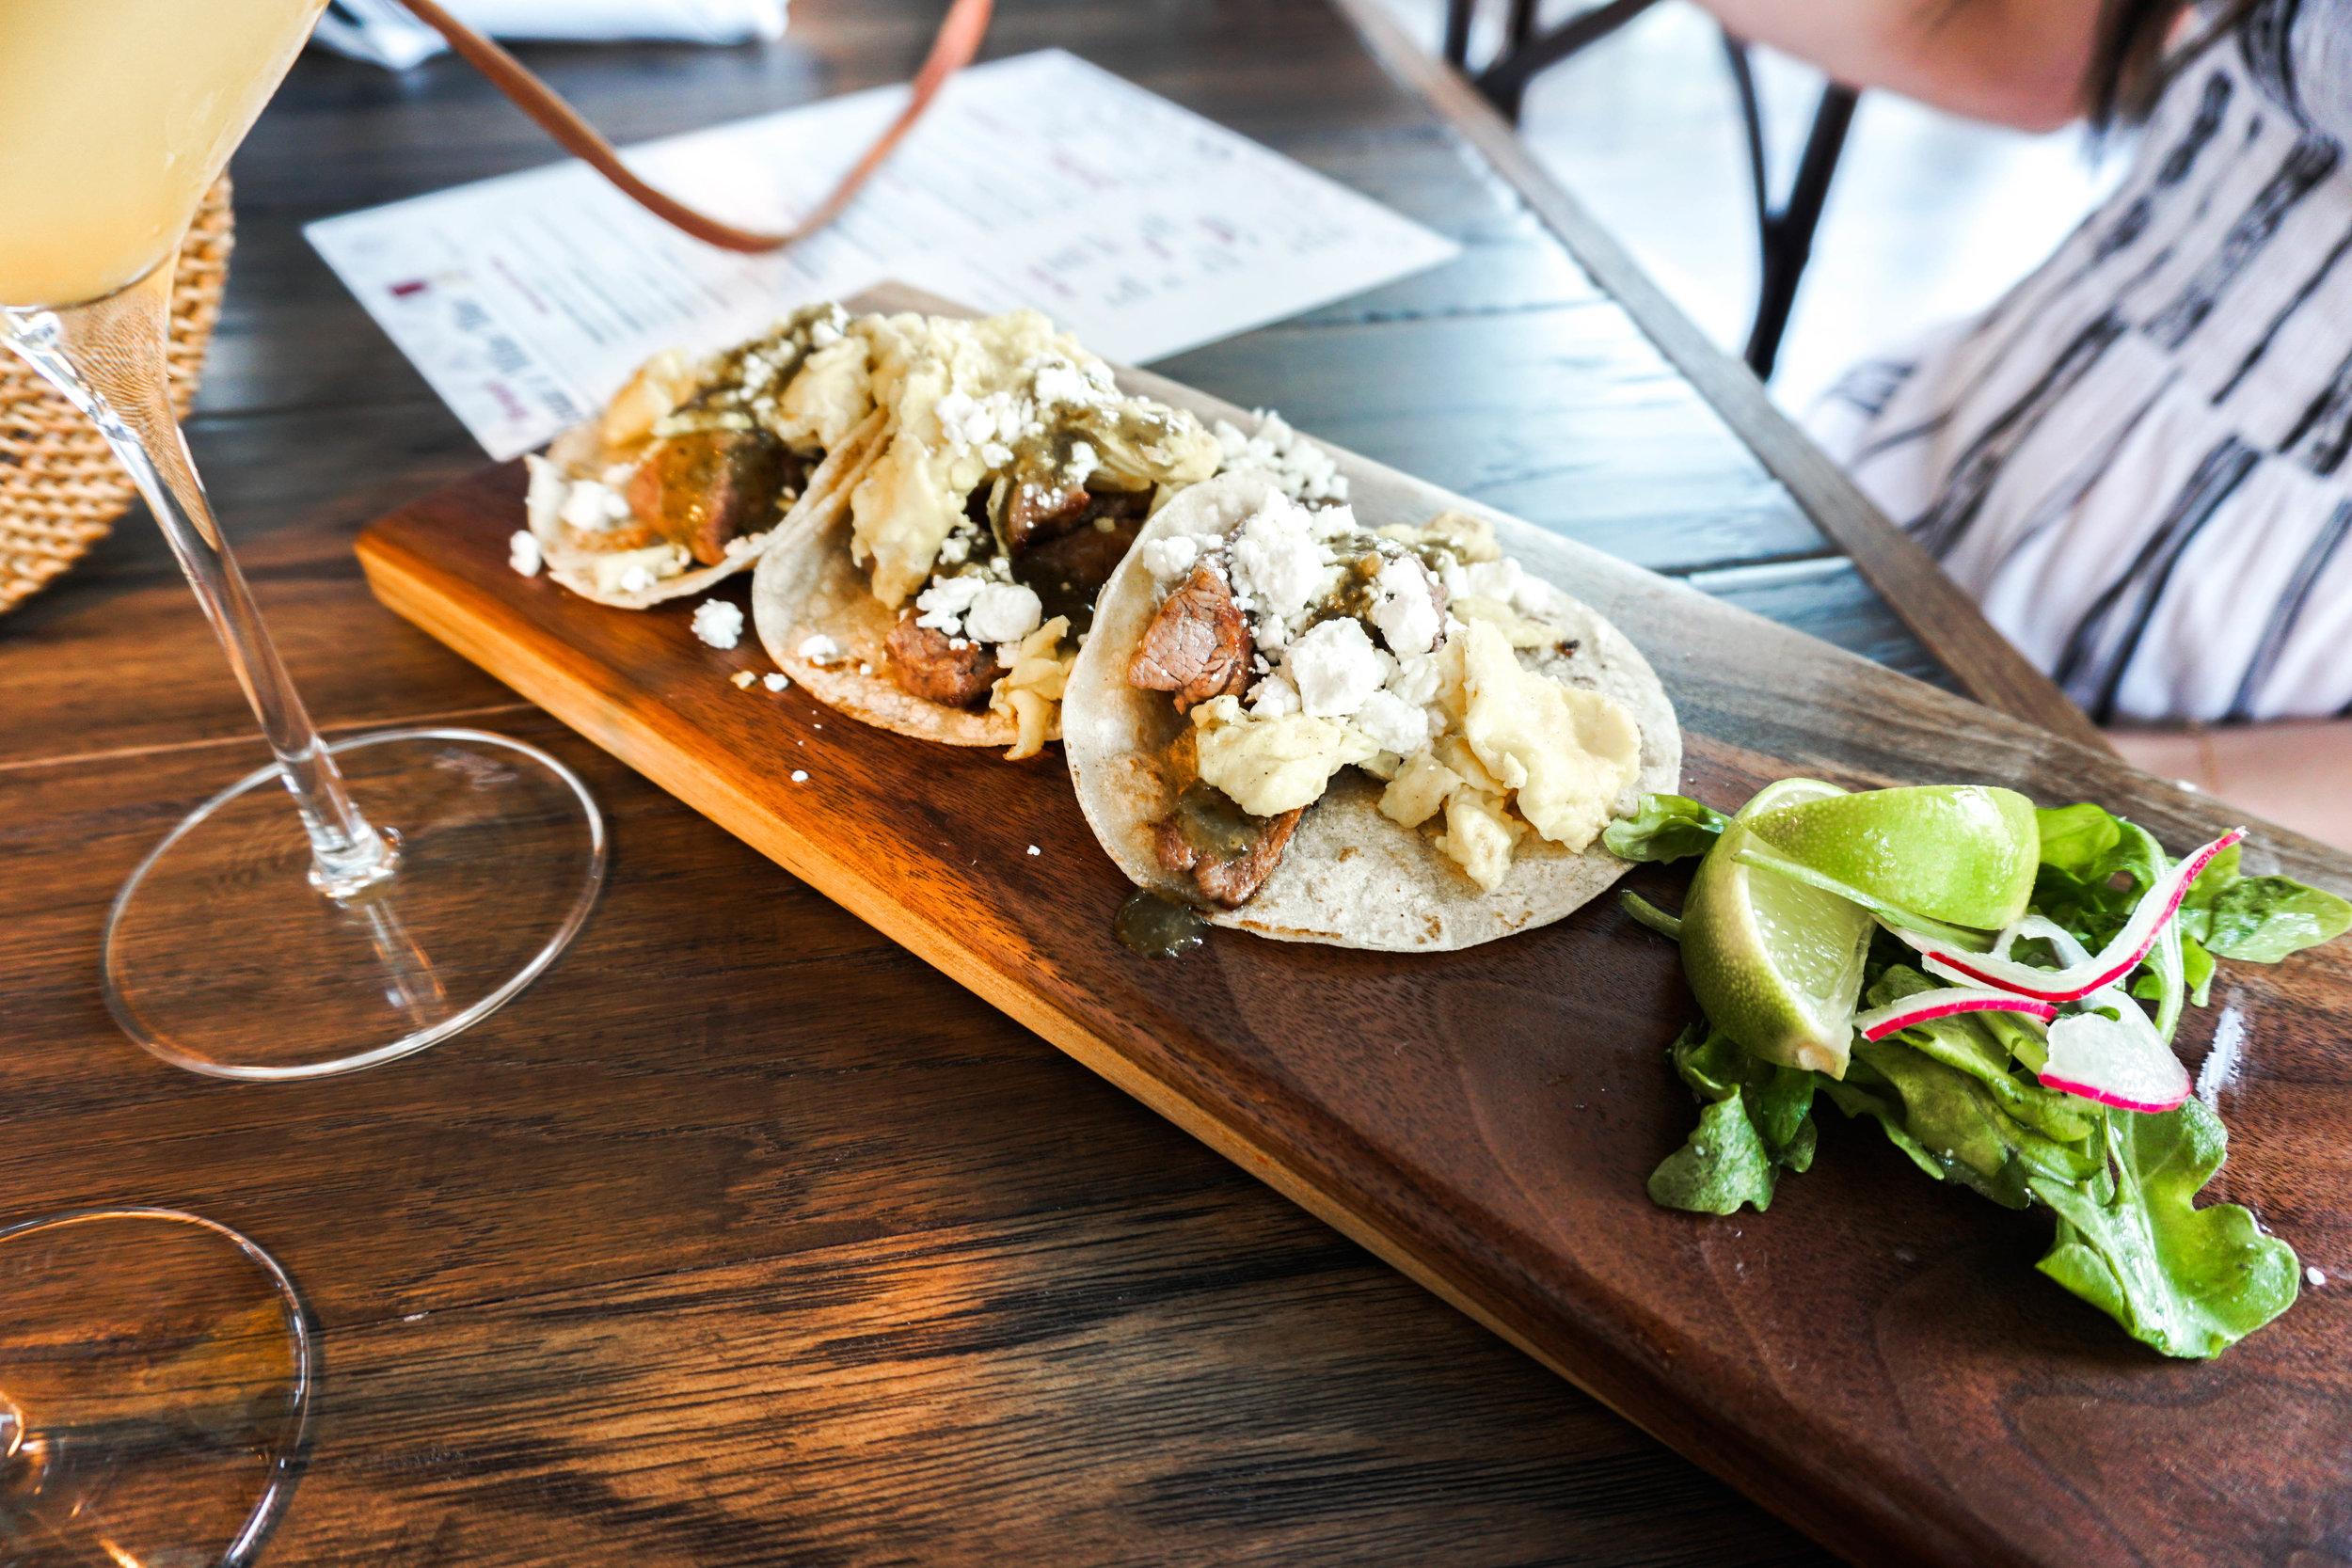 louies-wine-bar-tacos-nashville-where-to-eat.jpg